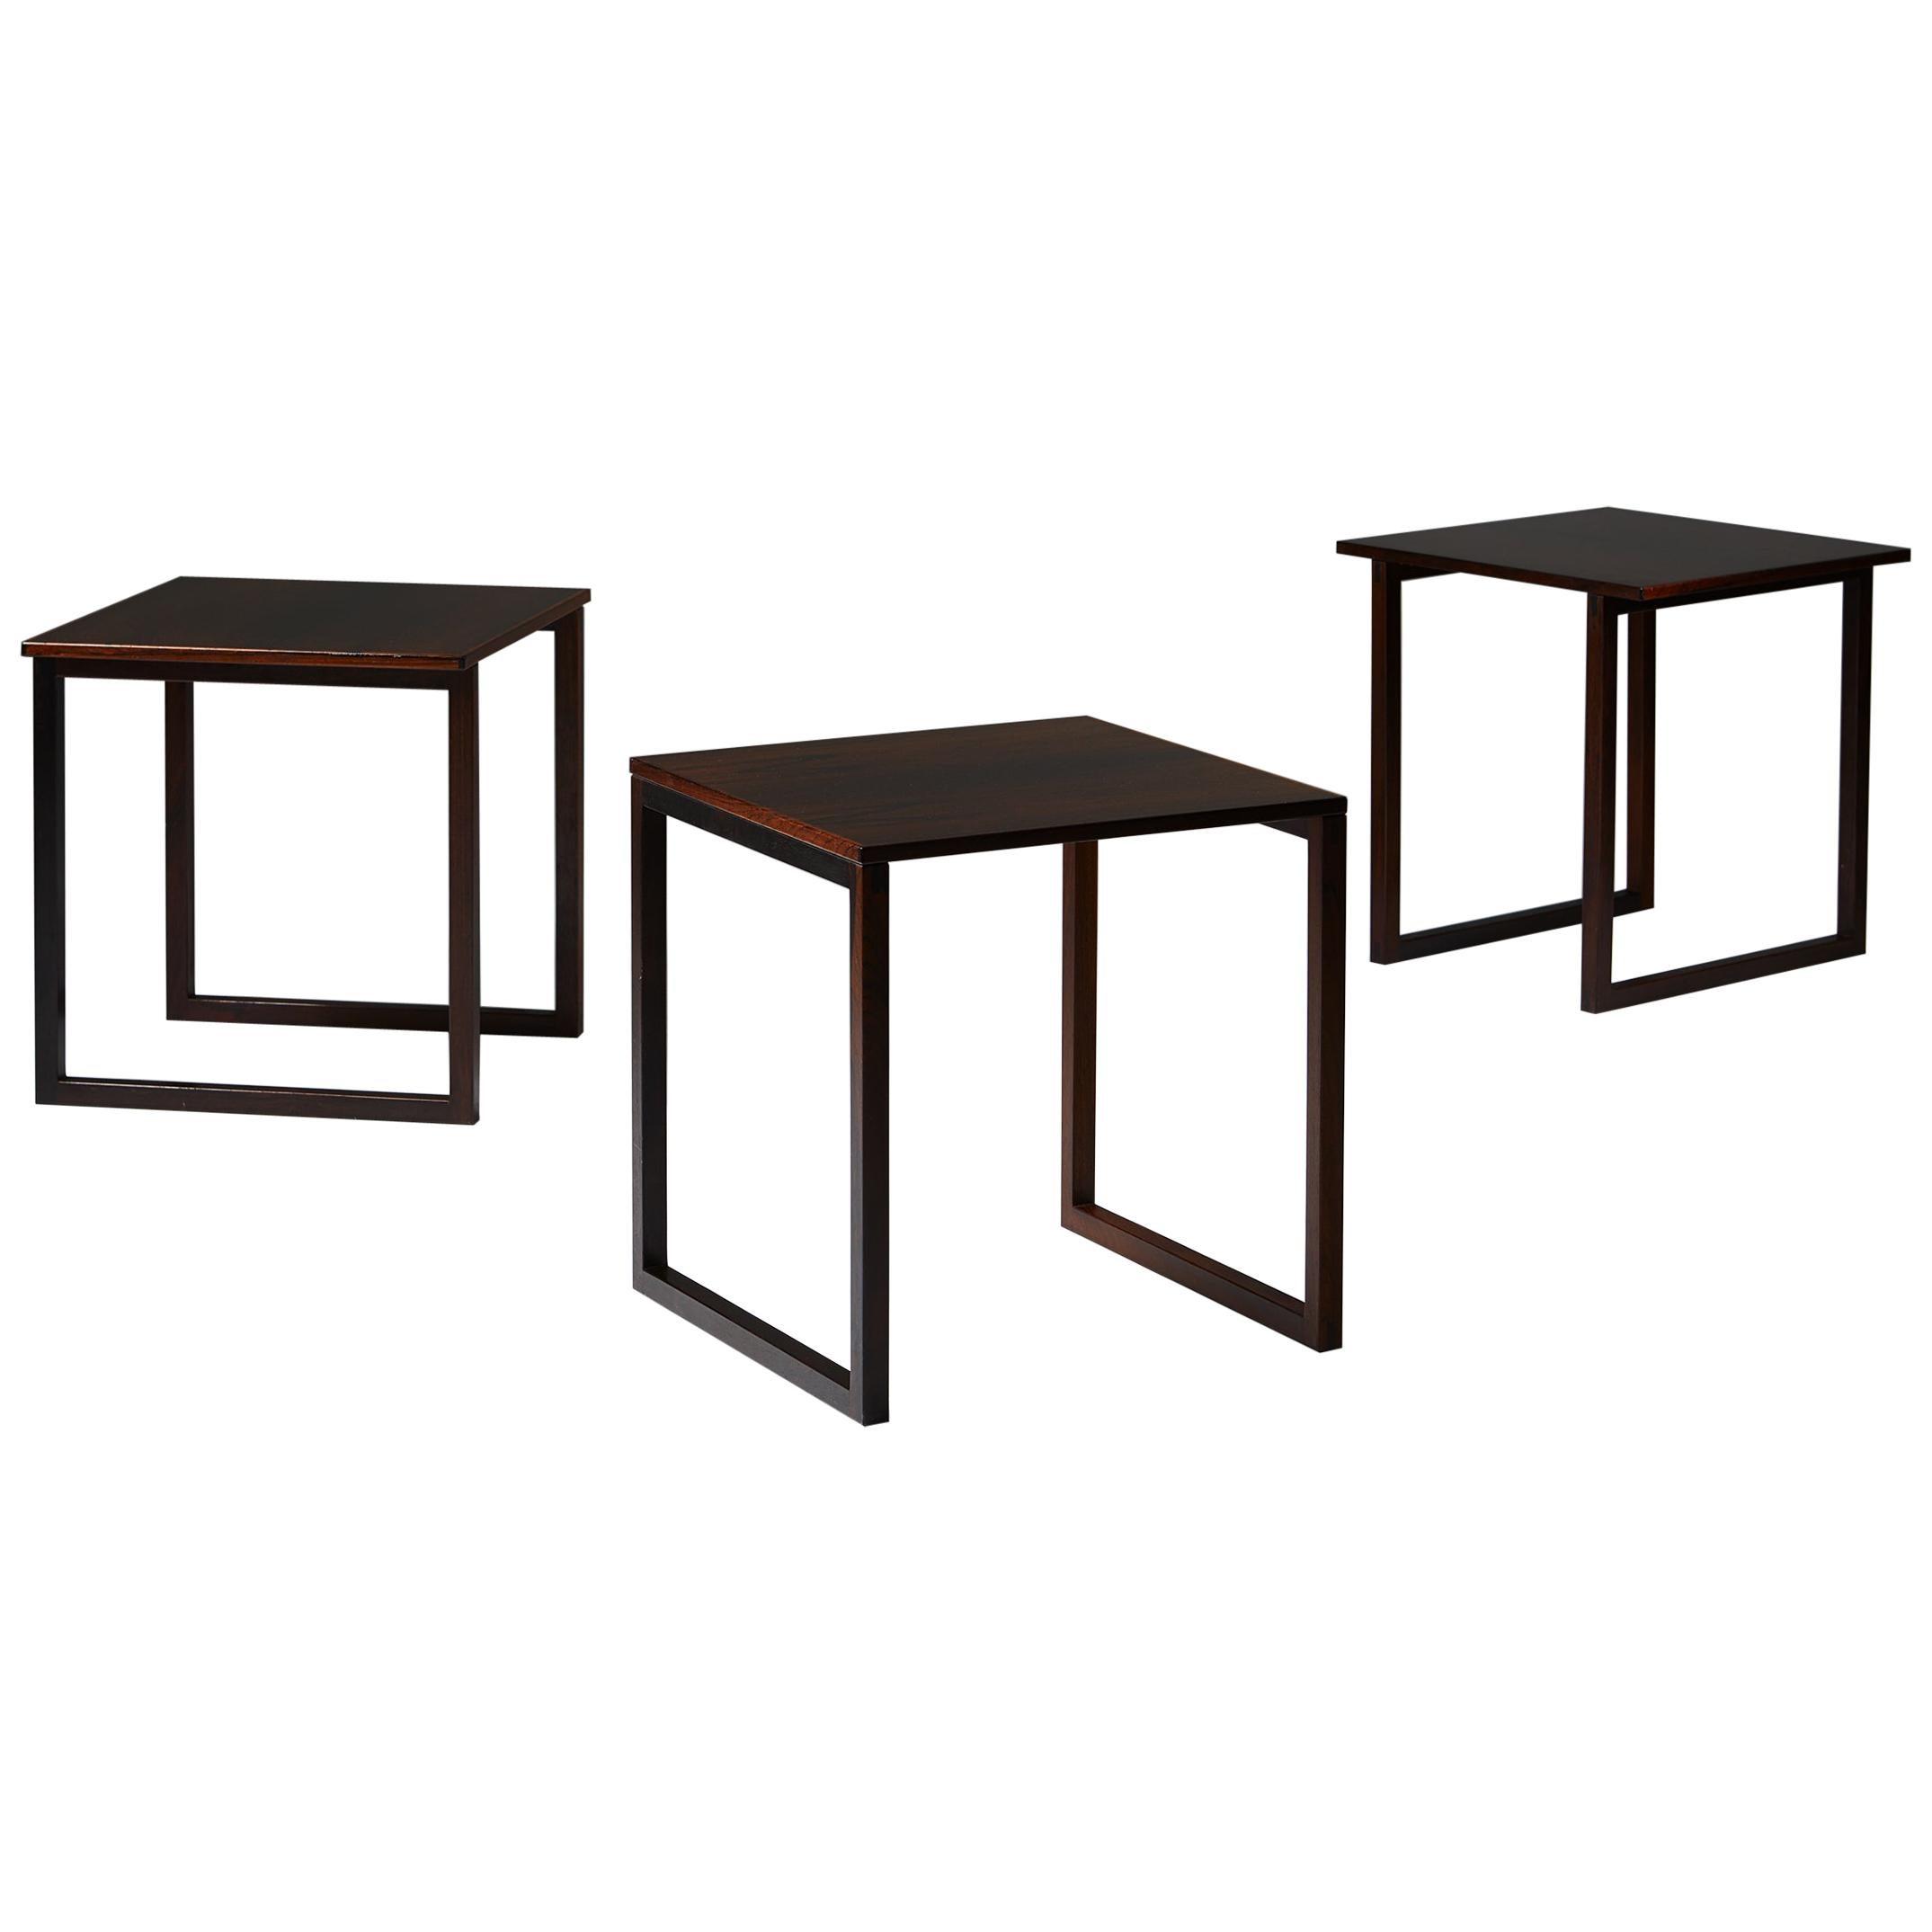 Set of Three Nesting Tables, Anonymous, Denmark, 1950s